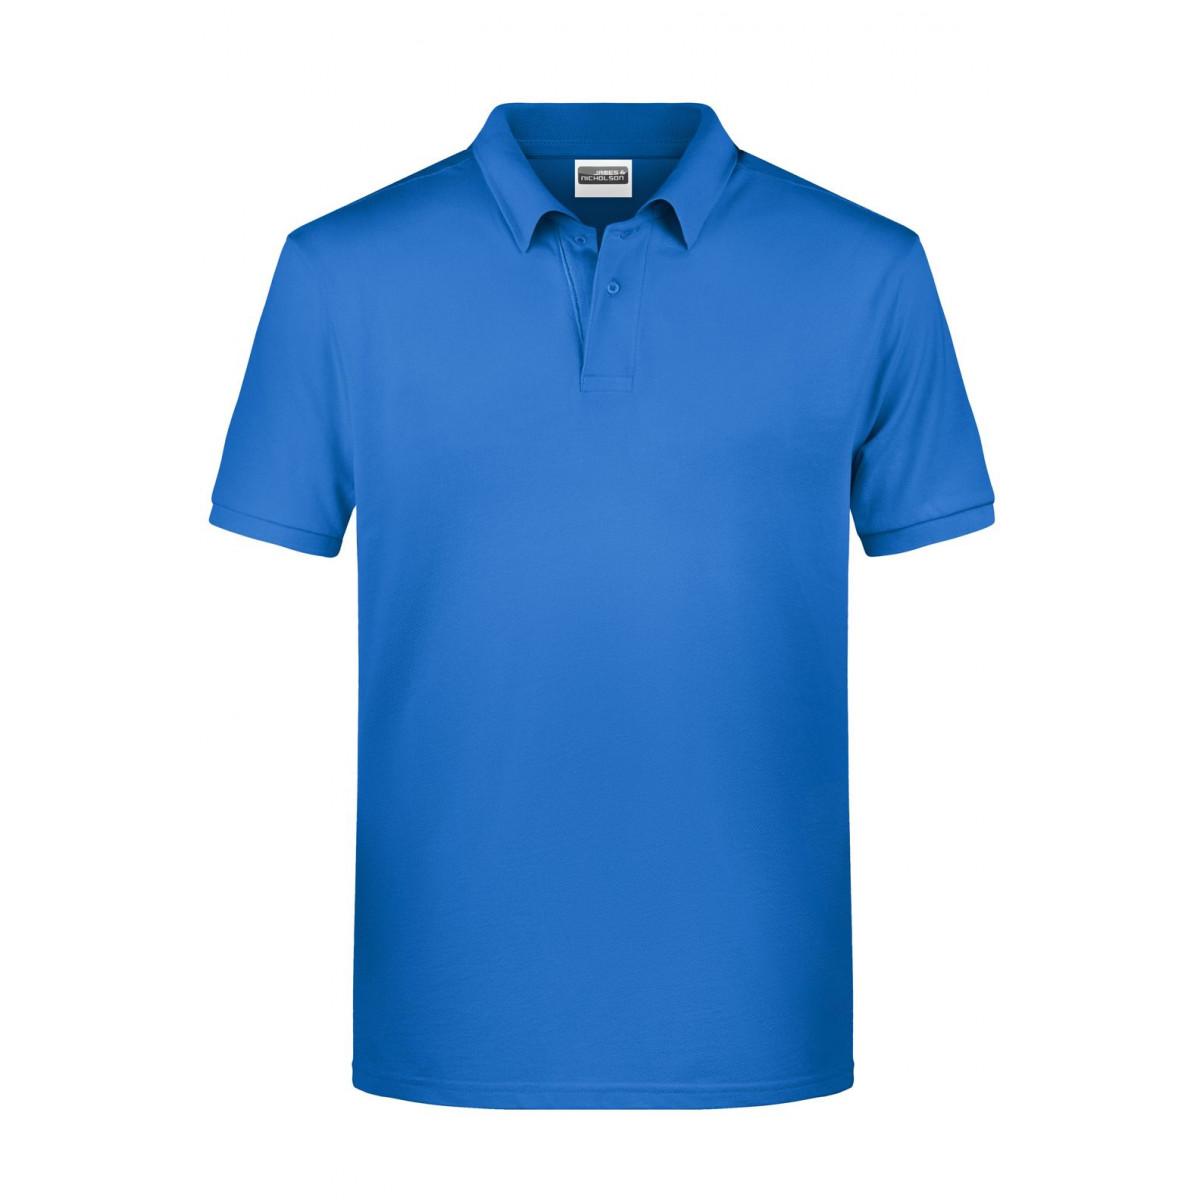 Рубашка поло мужская 8010 Mens Basic Polo - Кобальт